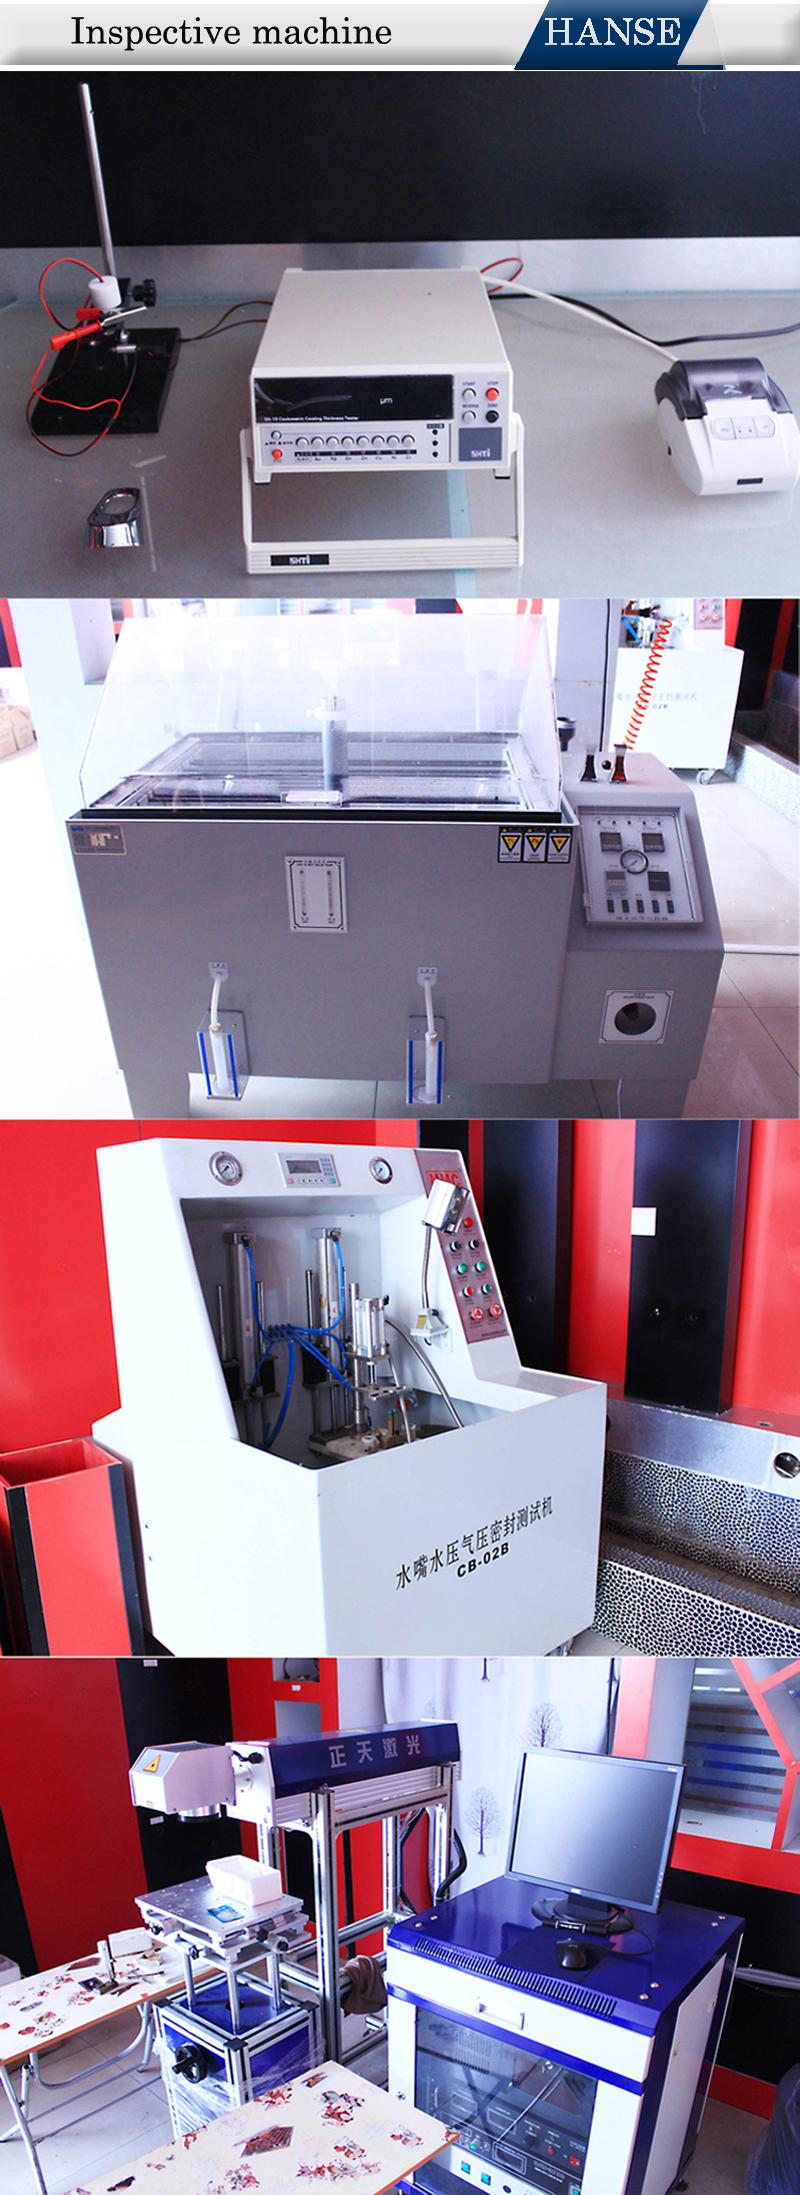 HS-F9922-1 wash hand basin tap,saving water tap sensor,gold faucet